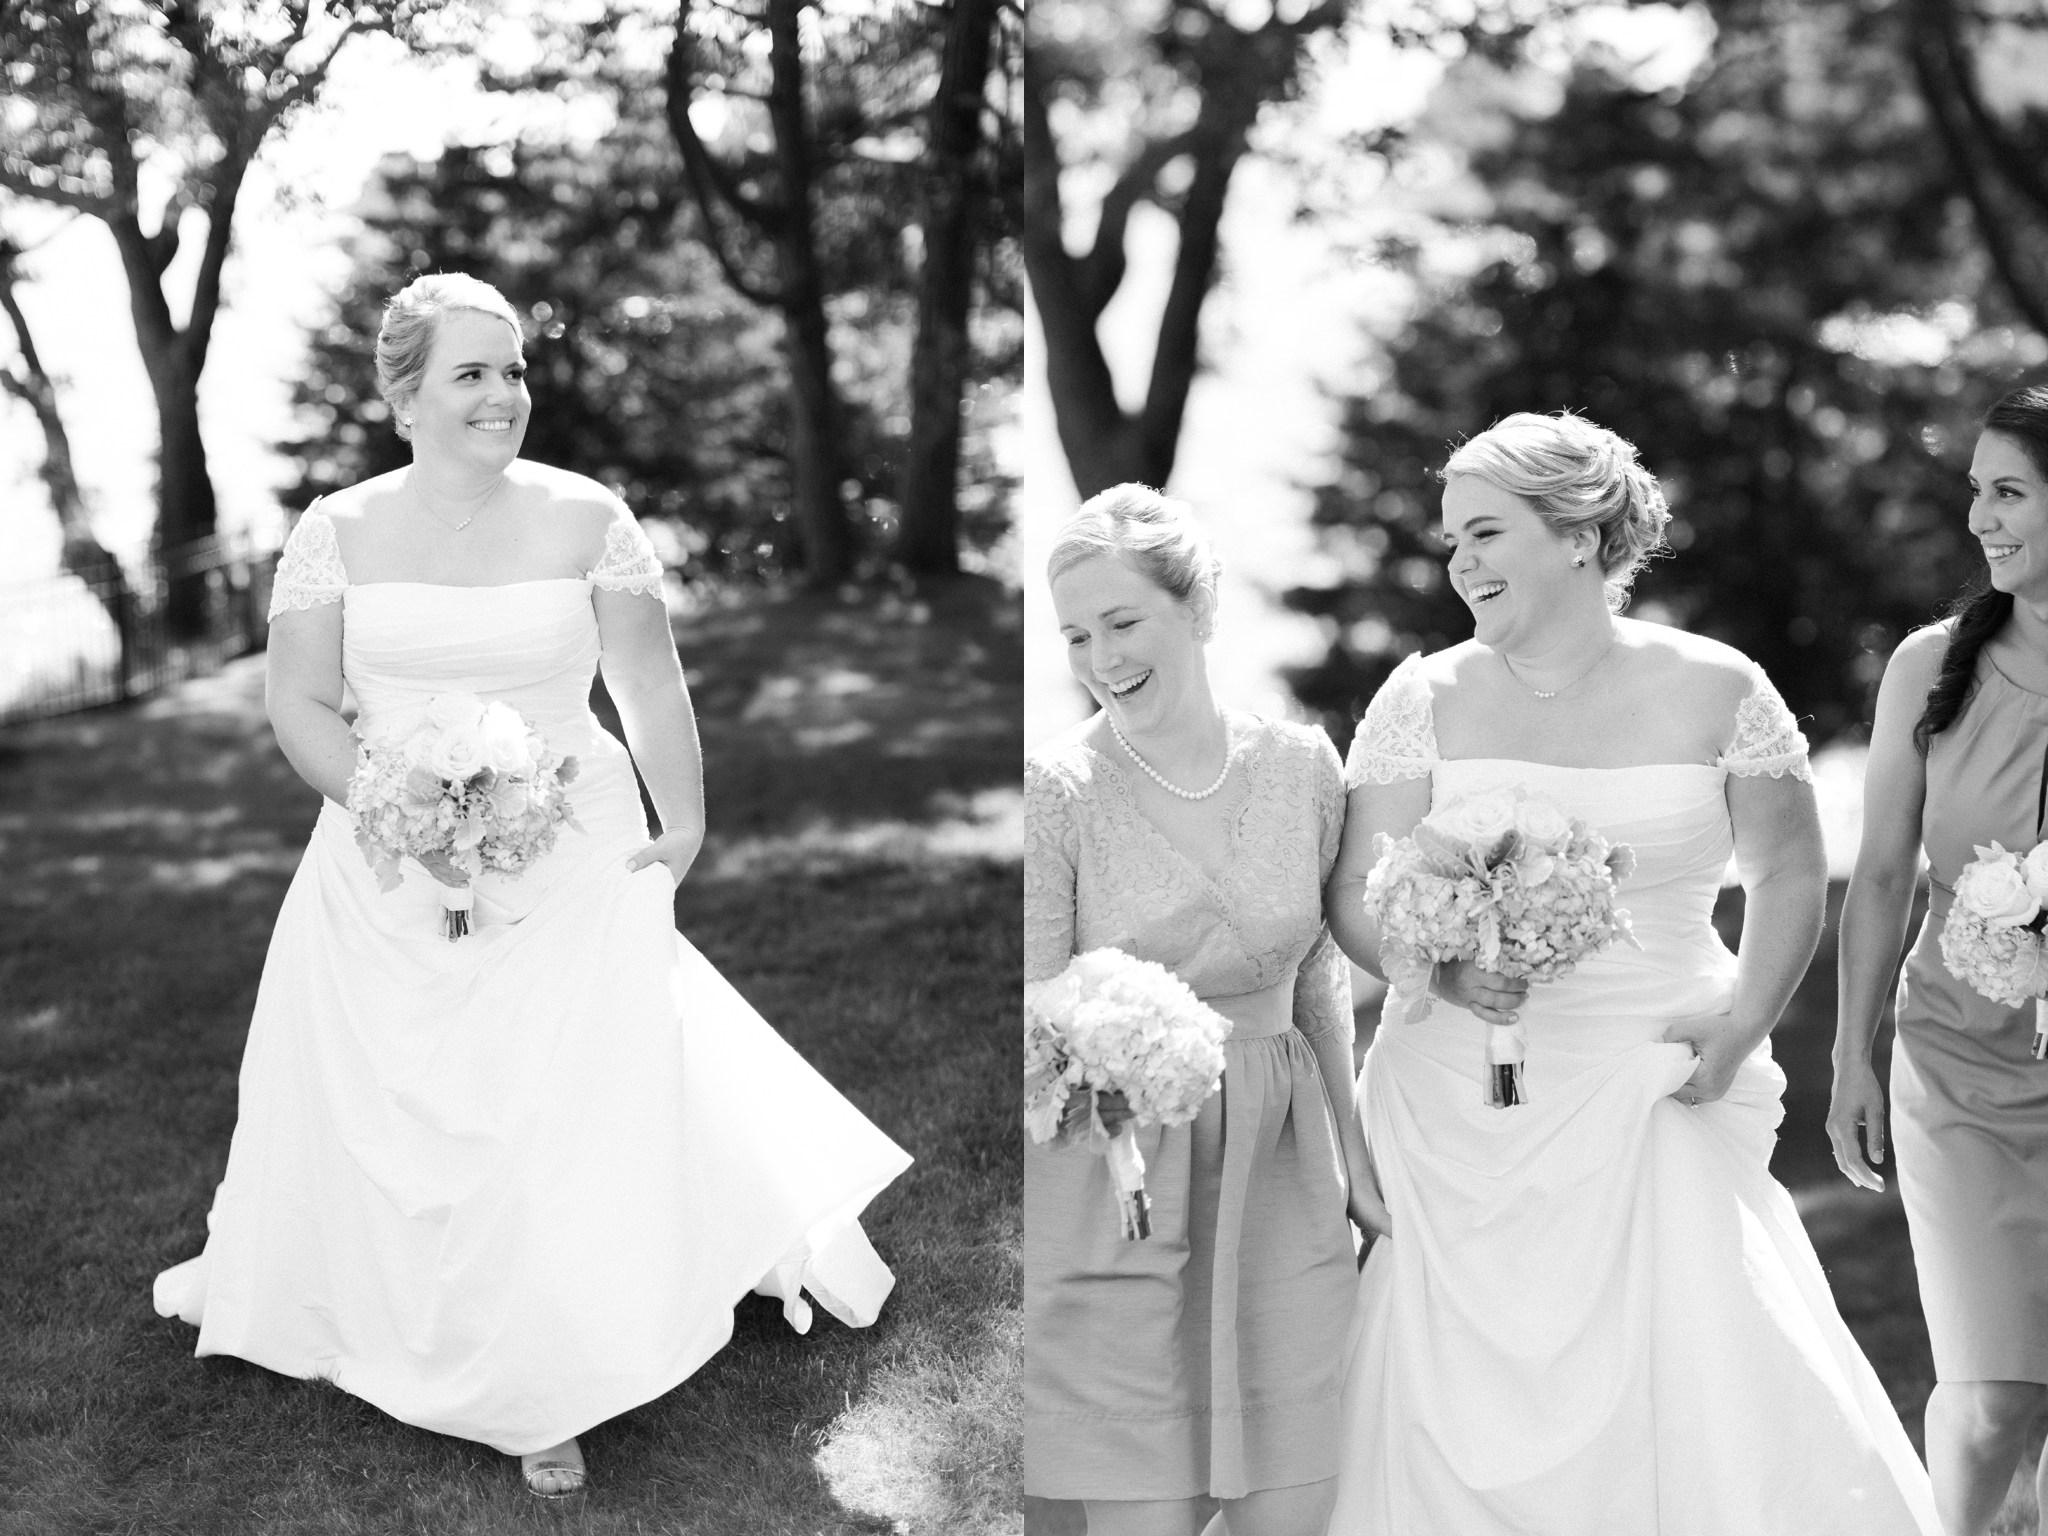 misselwood_endicott_college_wedding_photos_00031.JPG